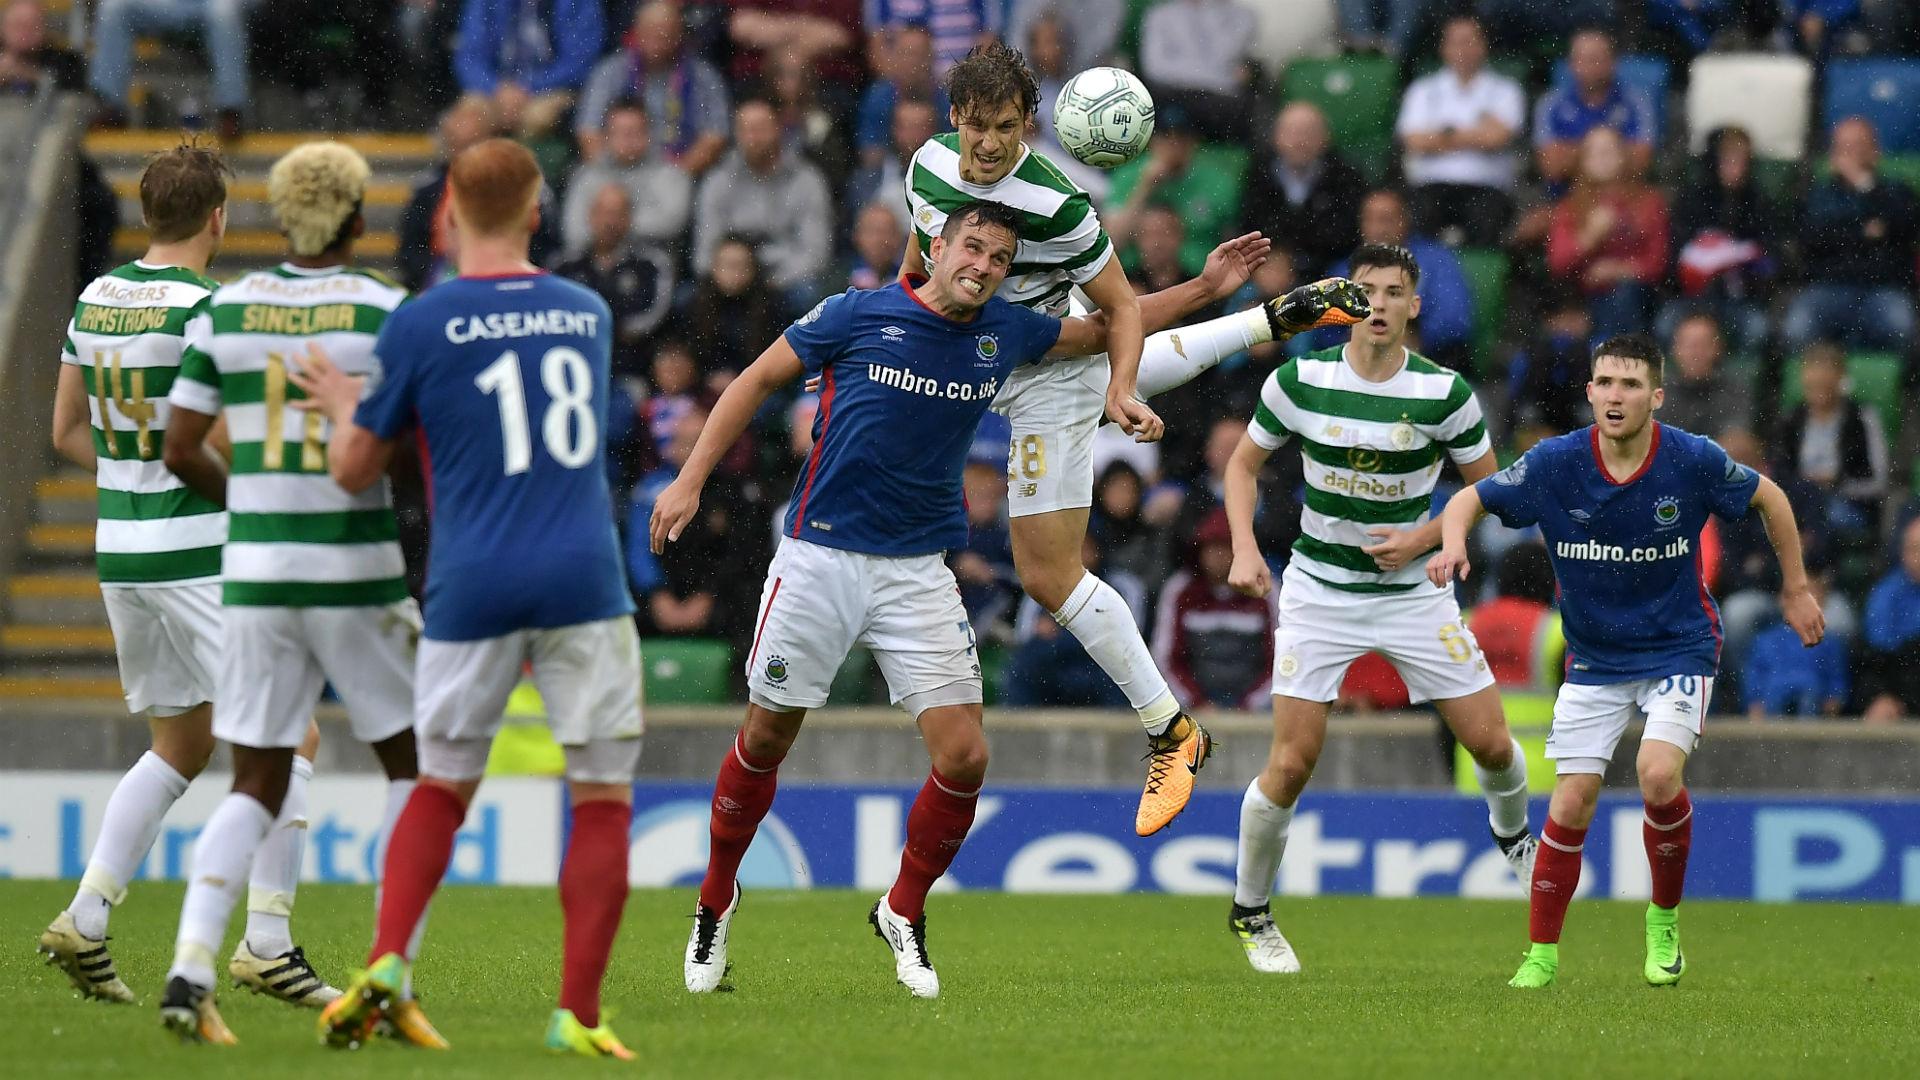 Linfield Celtic